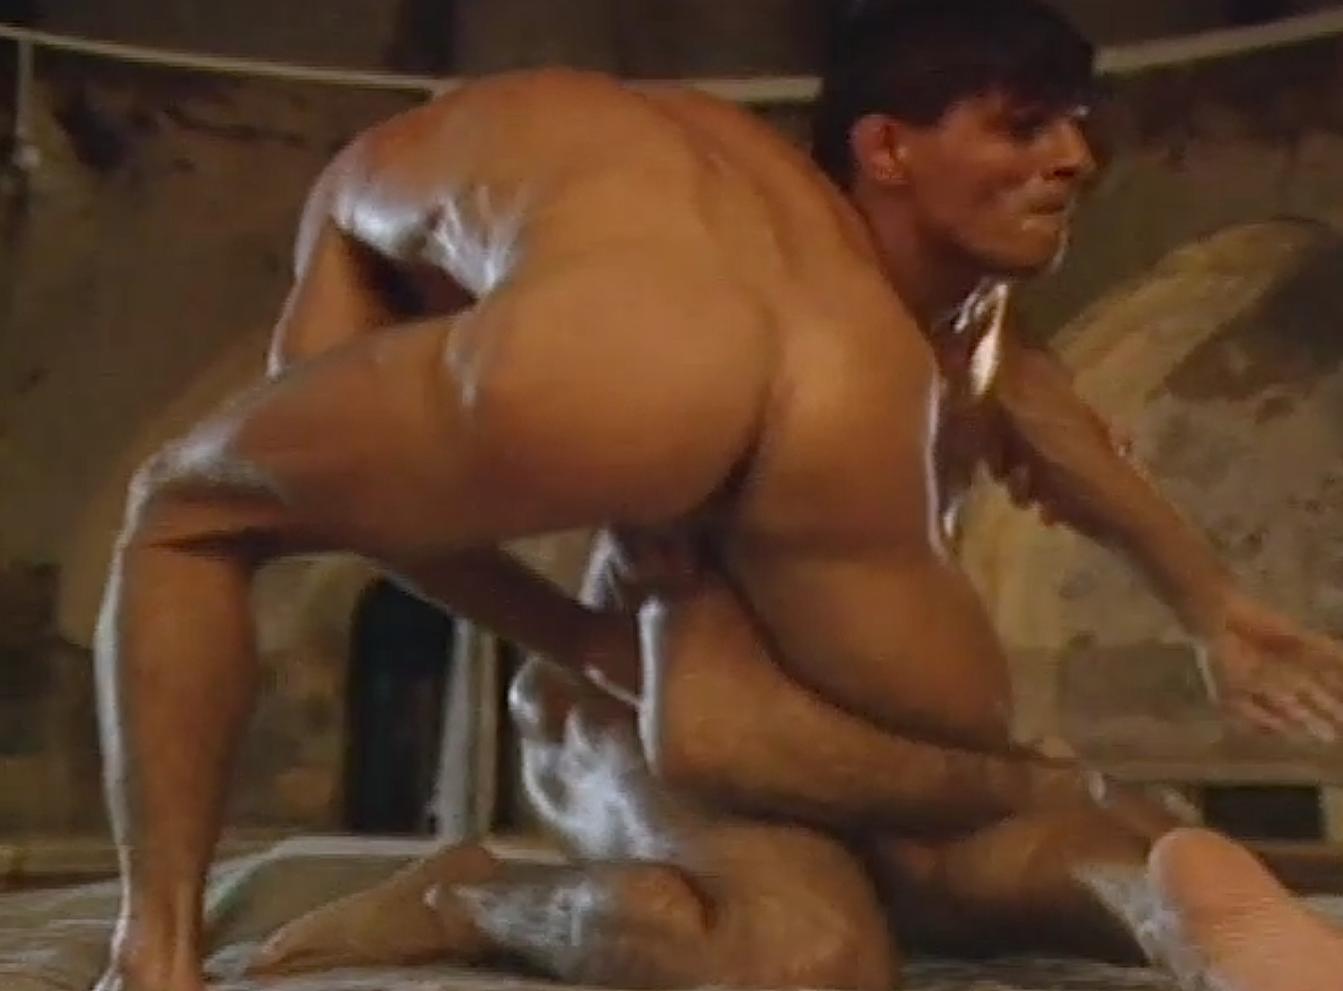 Nude movie of men pissing hot gay 4